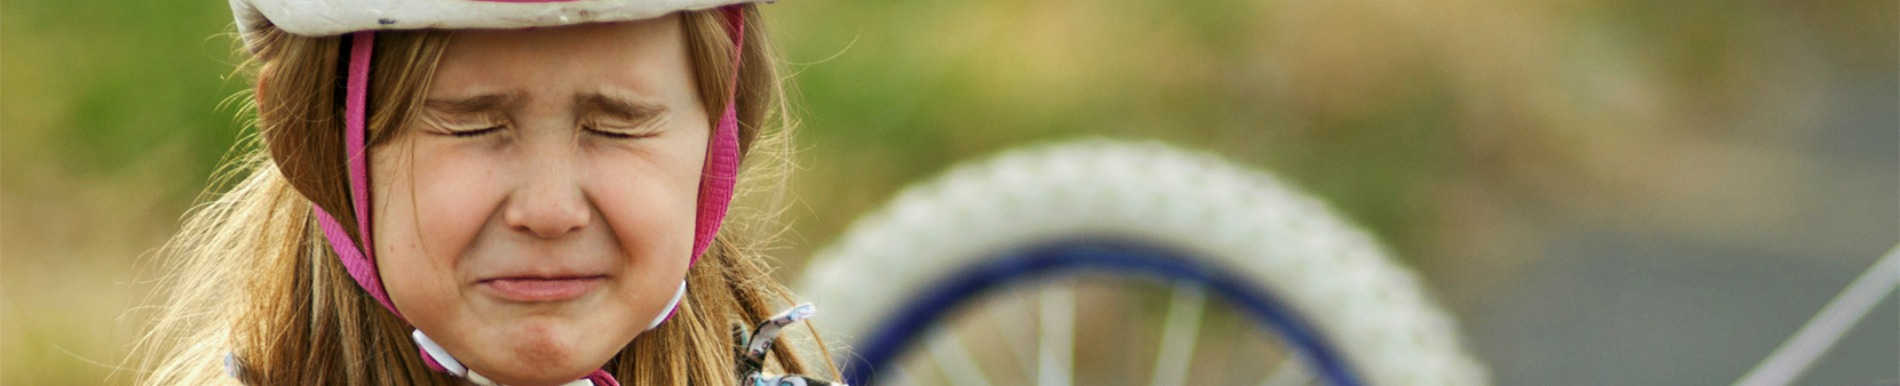 https://www.healthychildren.org/SiteCollectionImage-Homepage-Banners/bike_fall_header.jpg